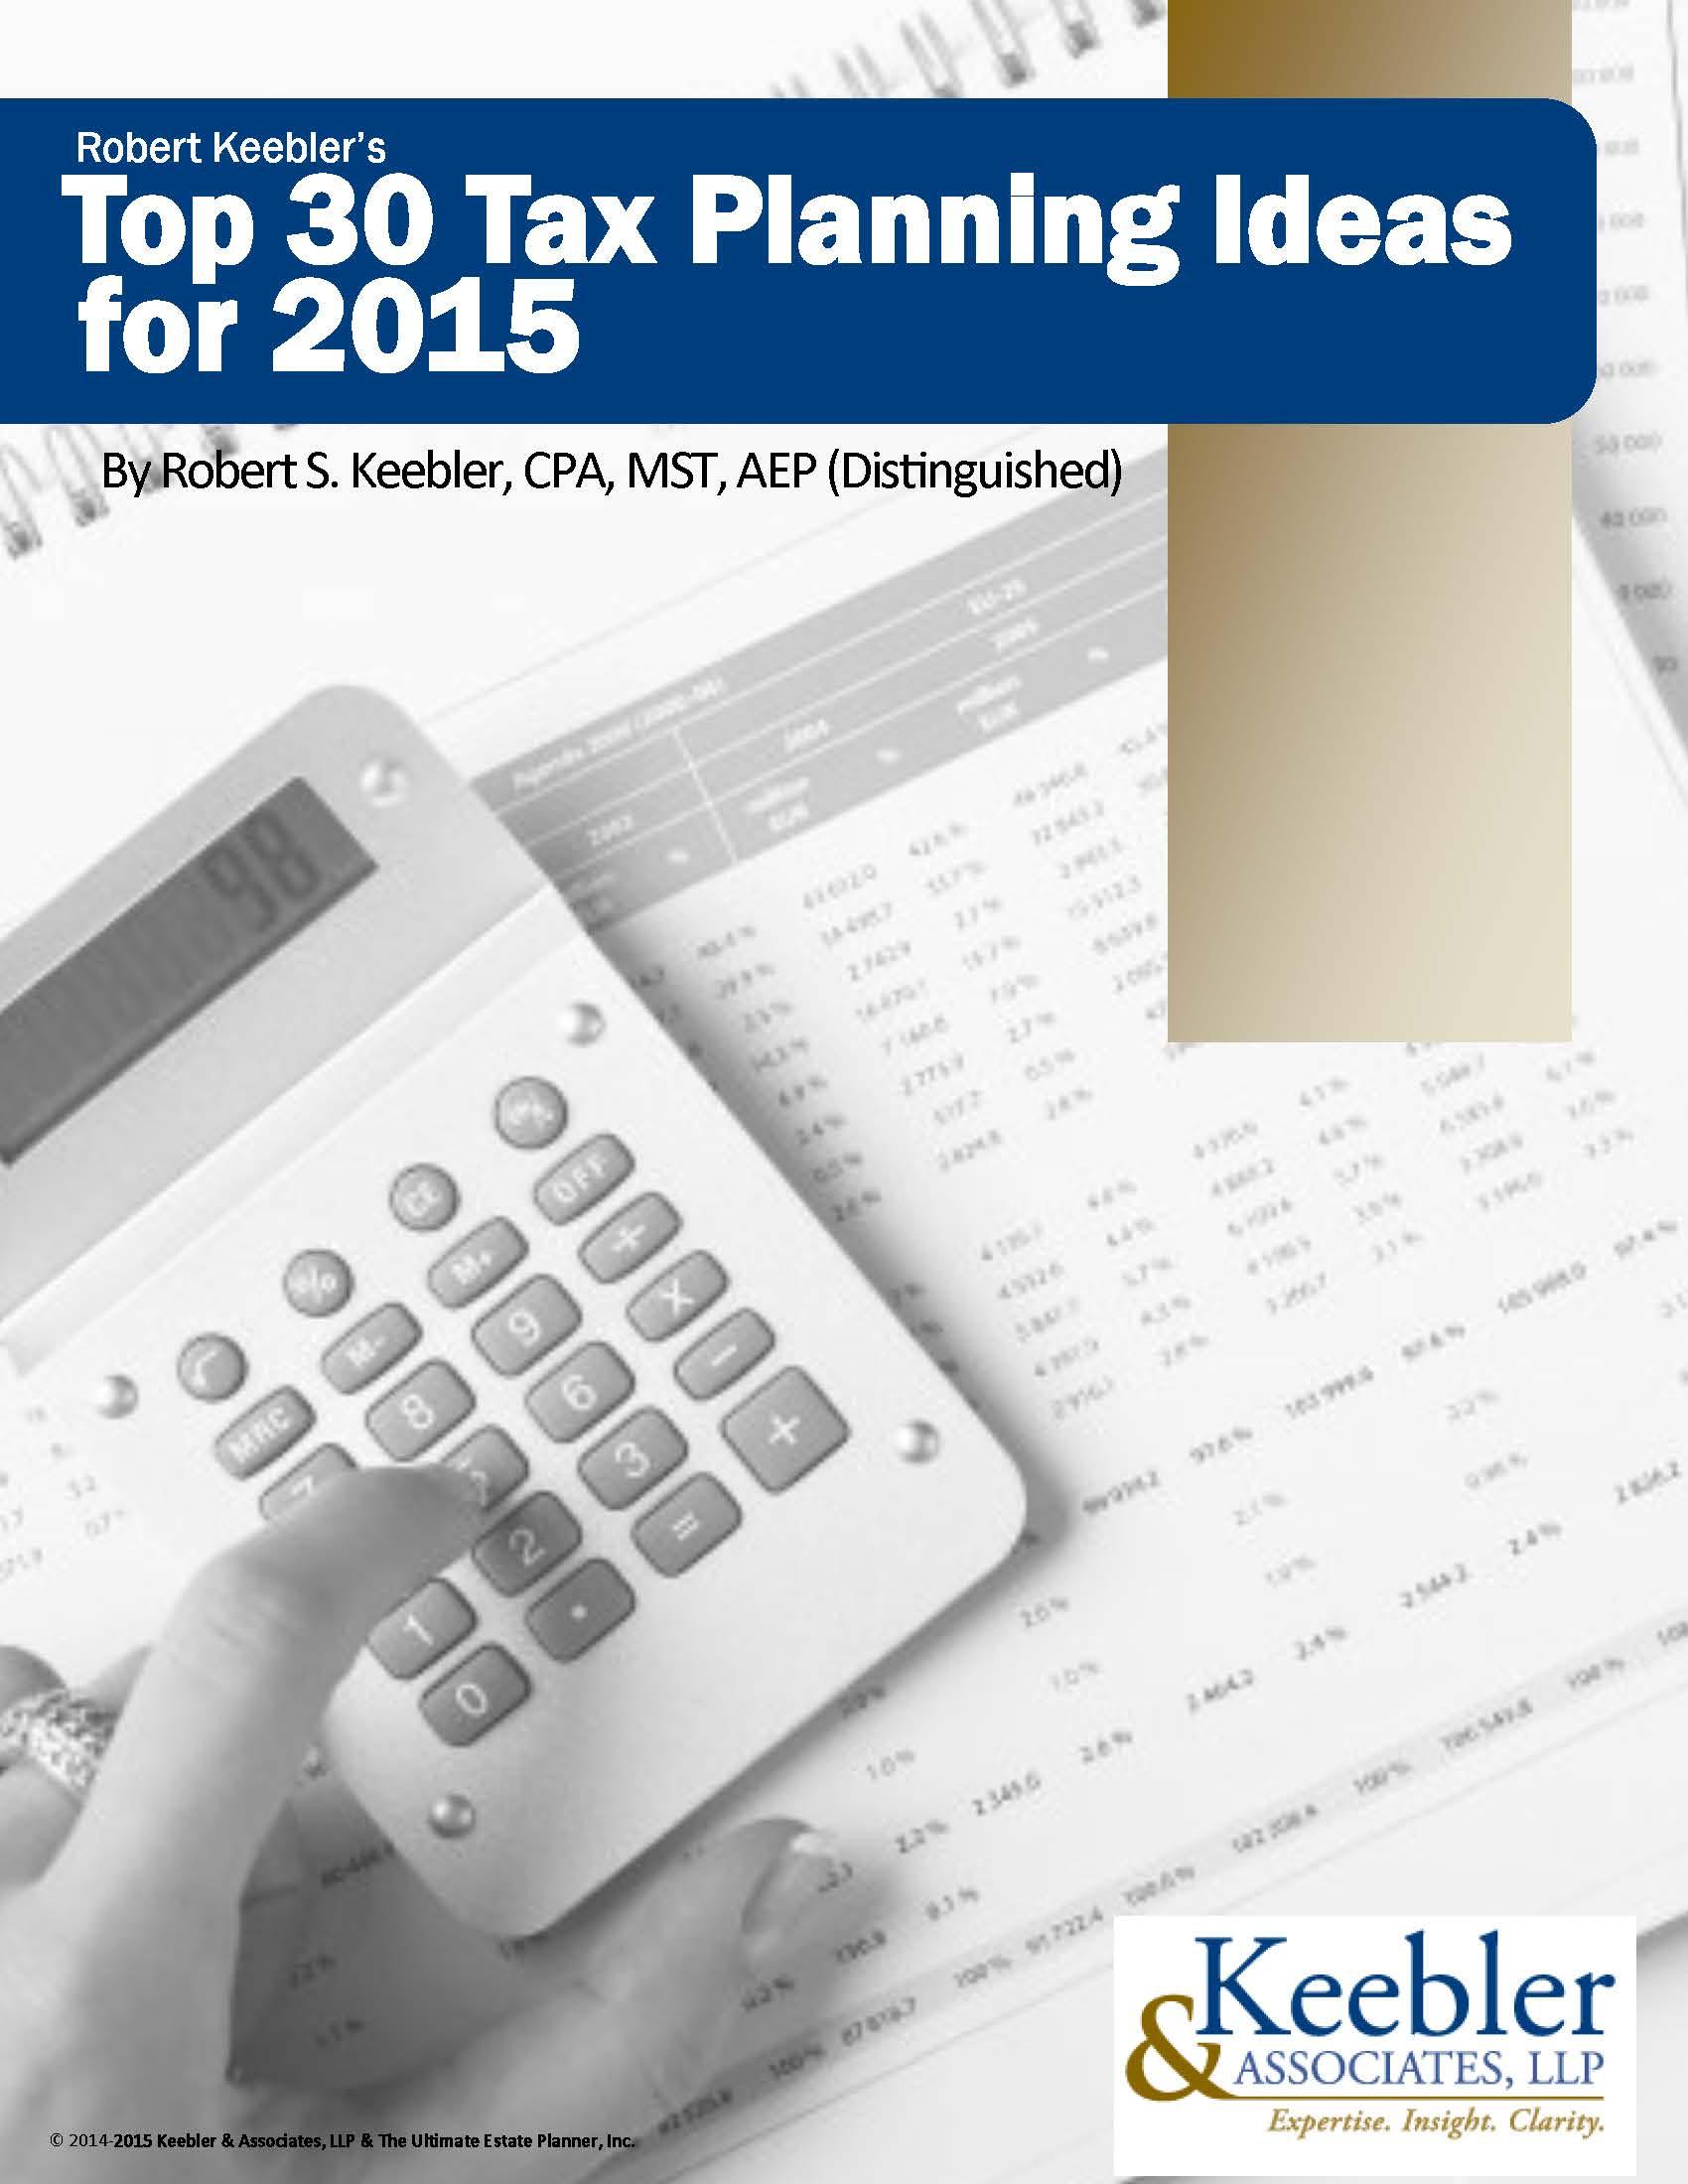 Robert-Keeblers-Top-30-Tax-Planning-Ideas-2015